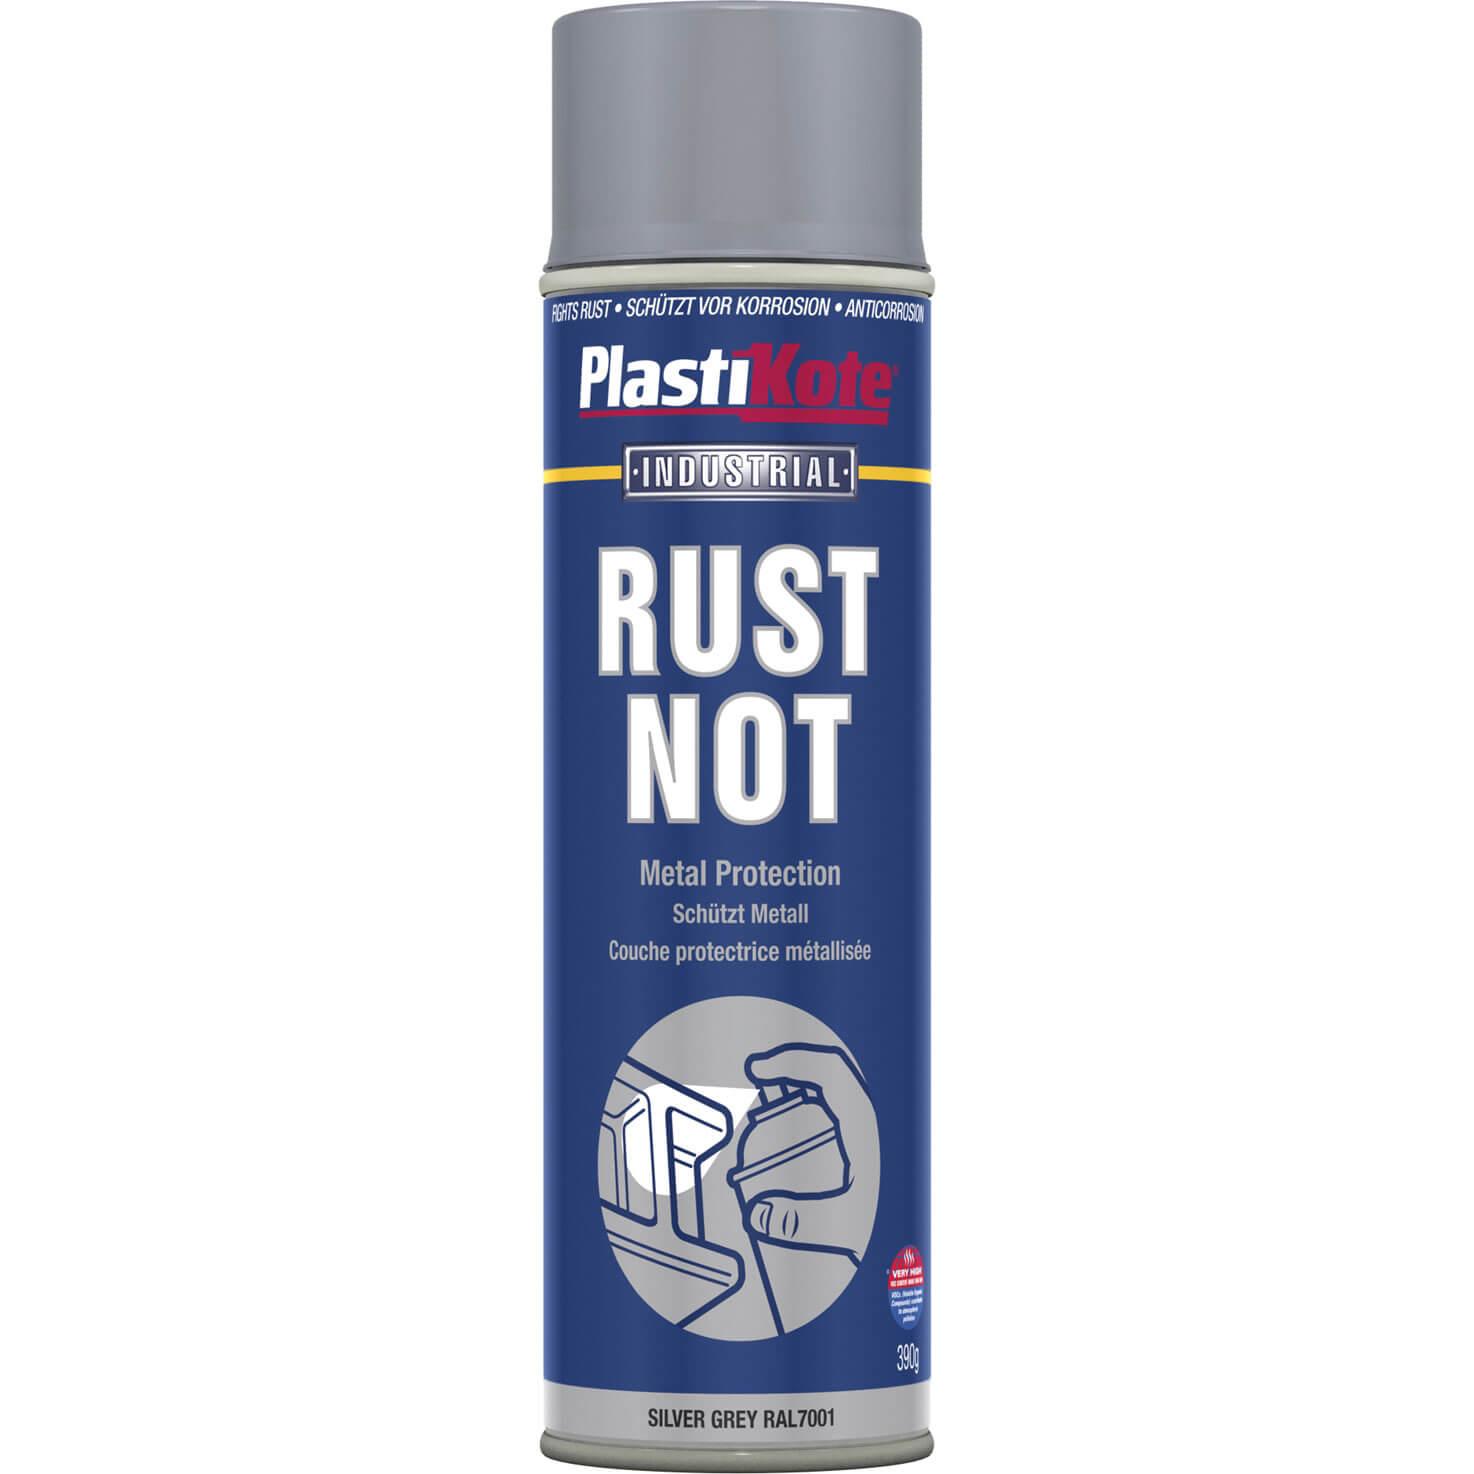 Image of Plastikote Rust Not Aerosol Spray Paint Silver Grey 500ml